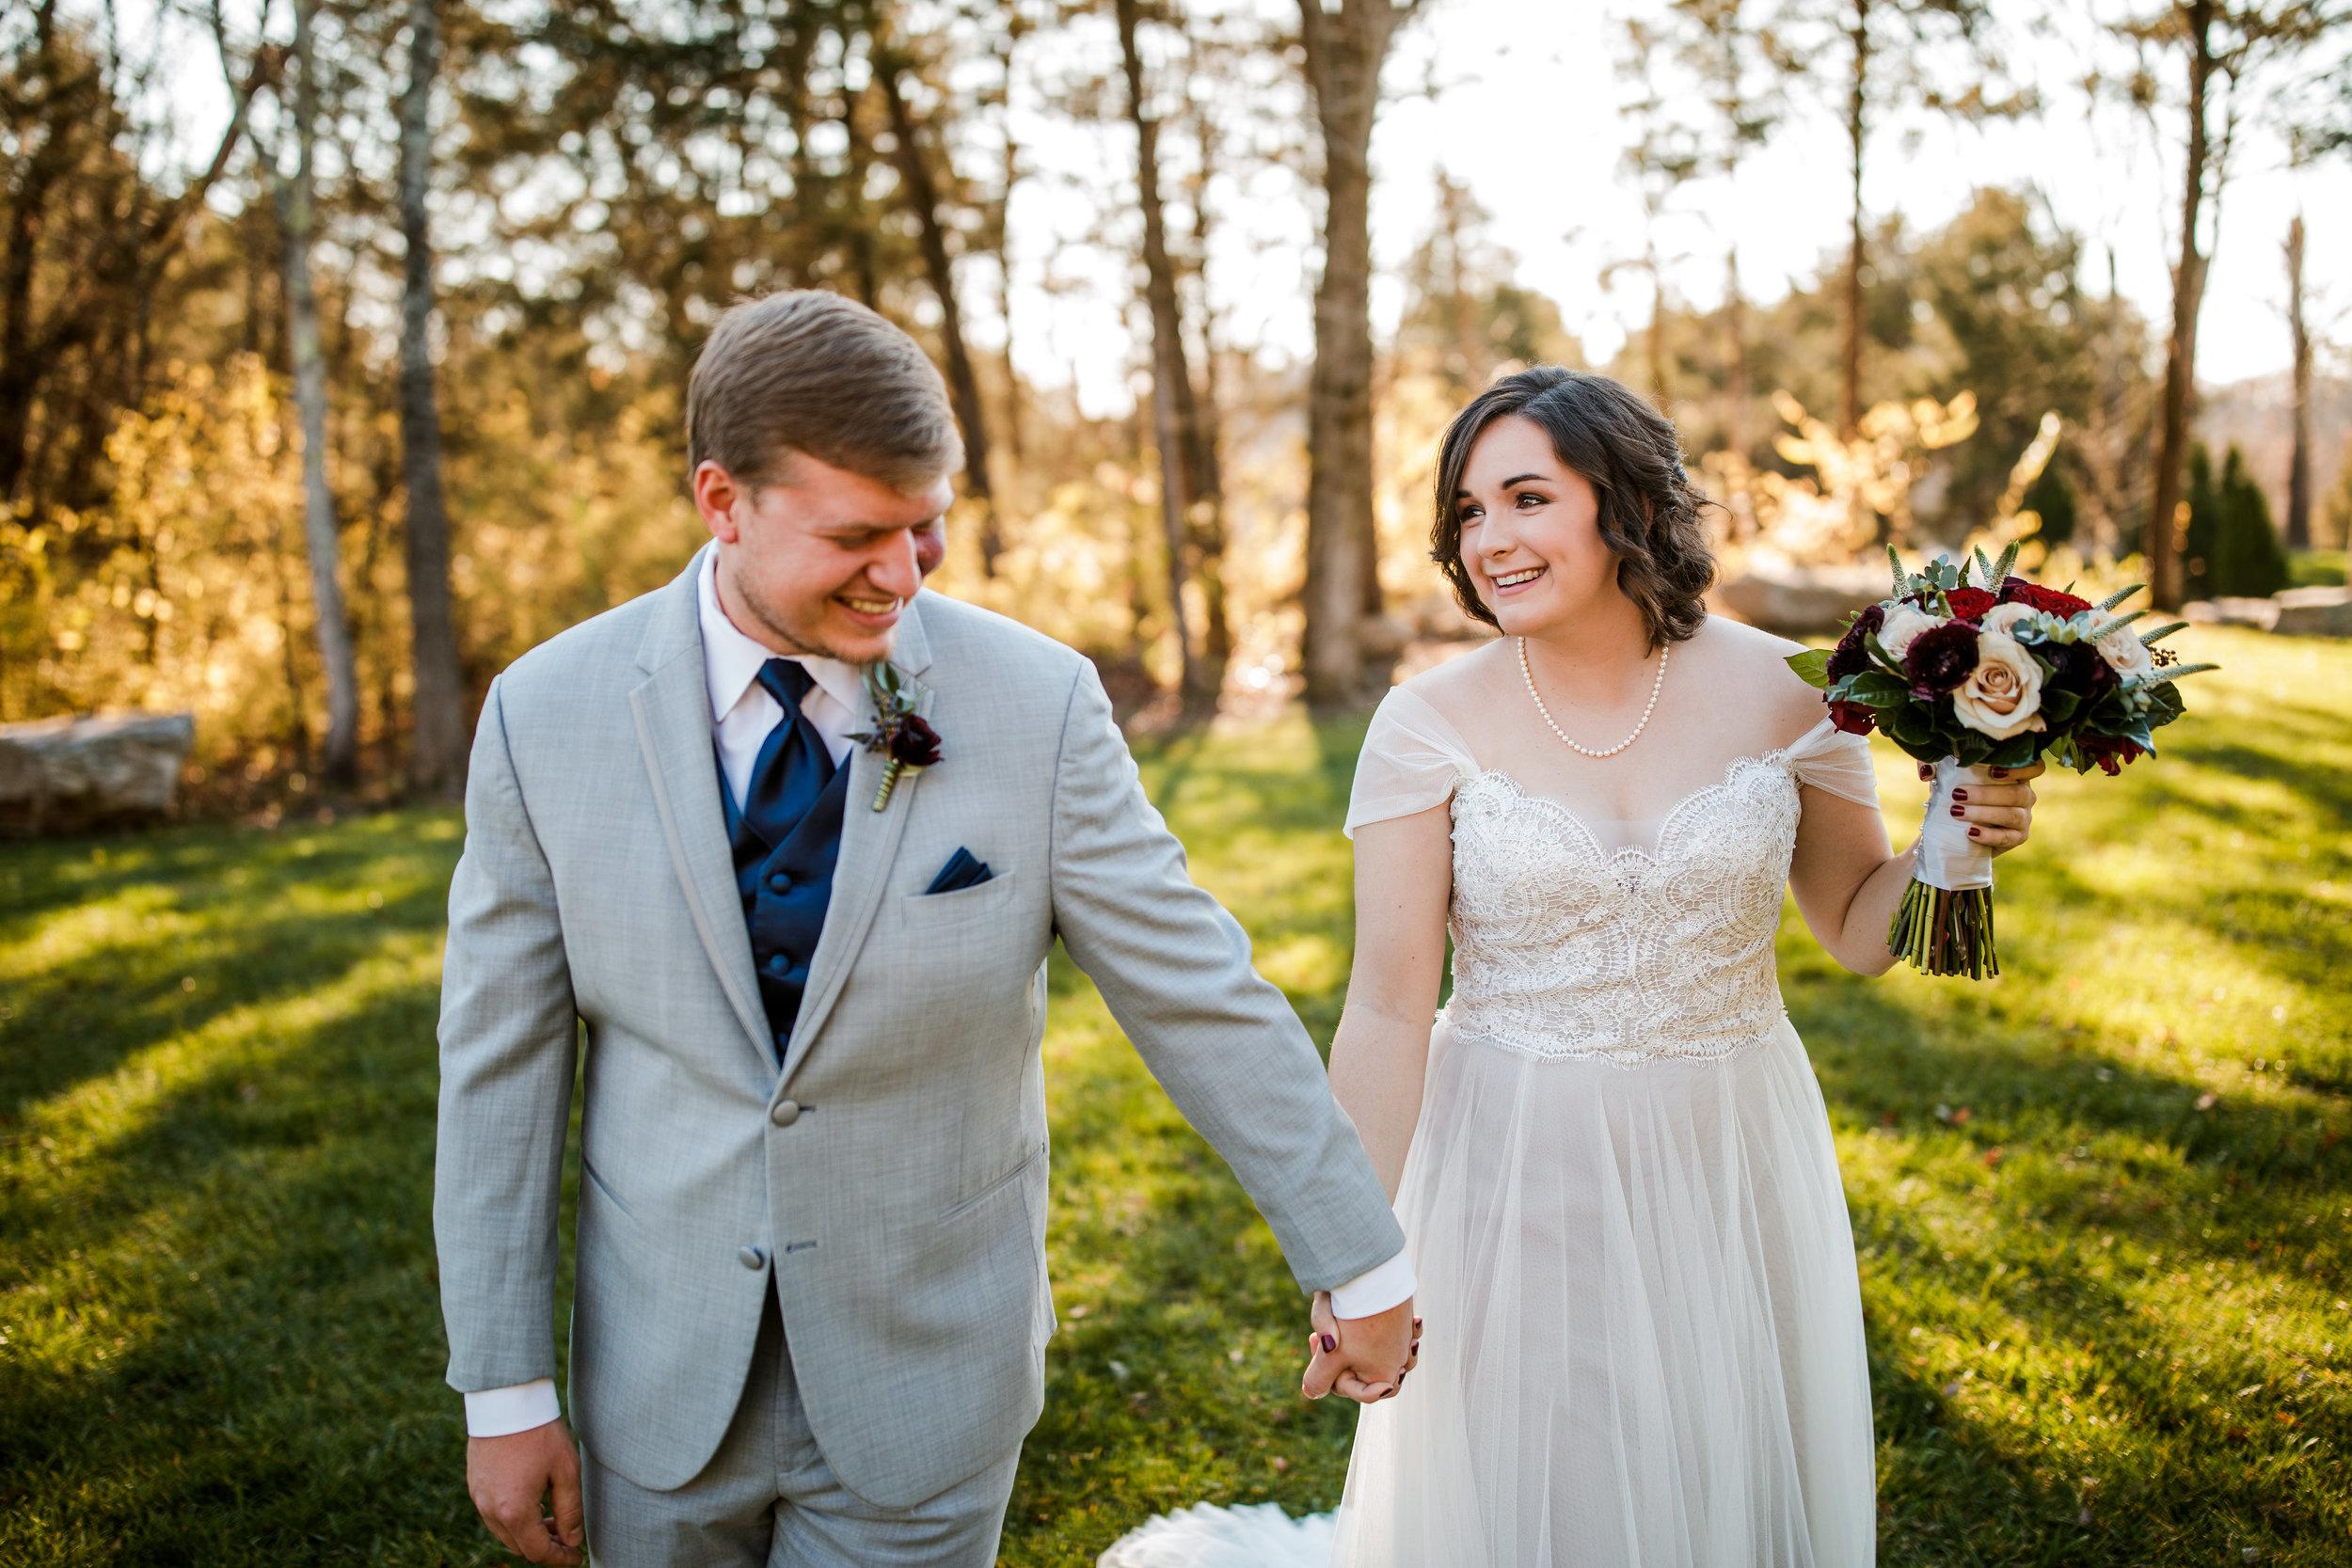 Graystone-Quarry-Wedding 27.jpg